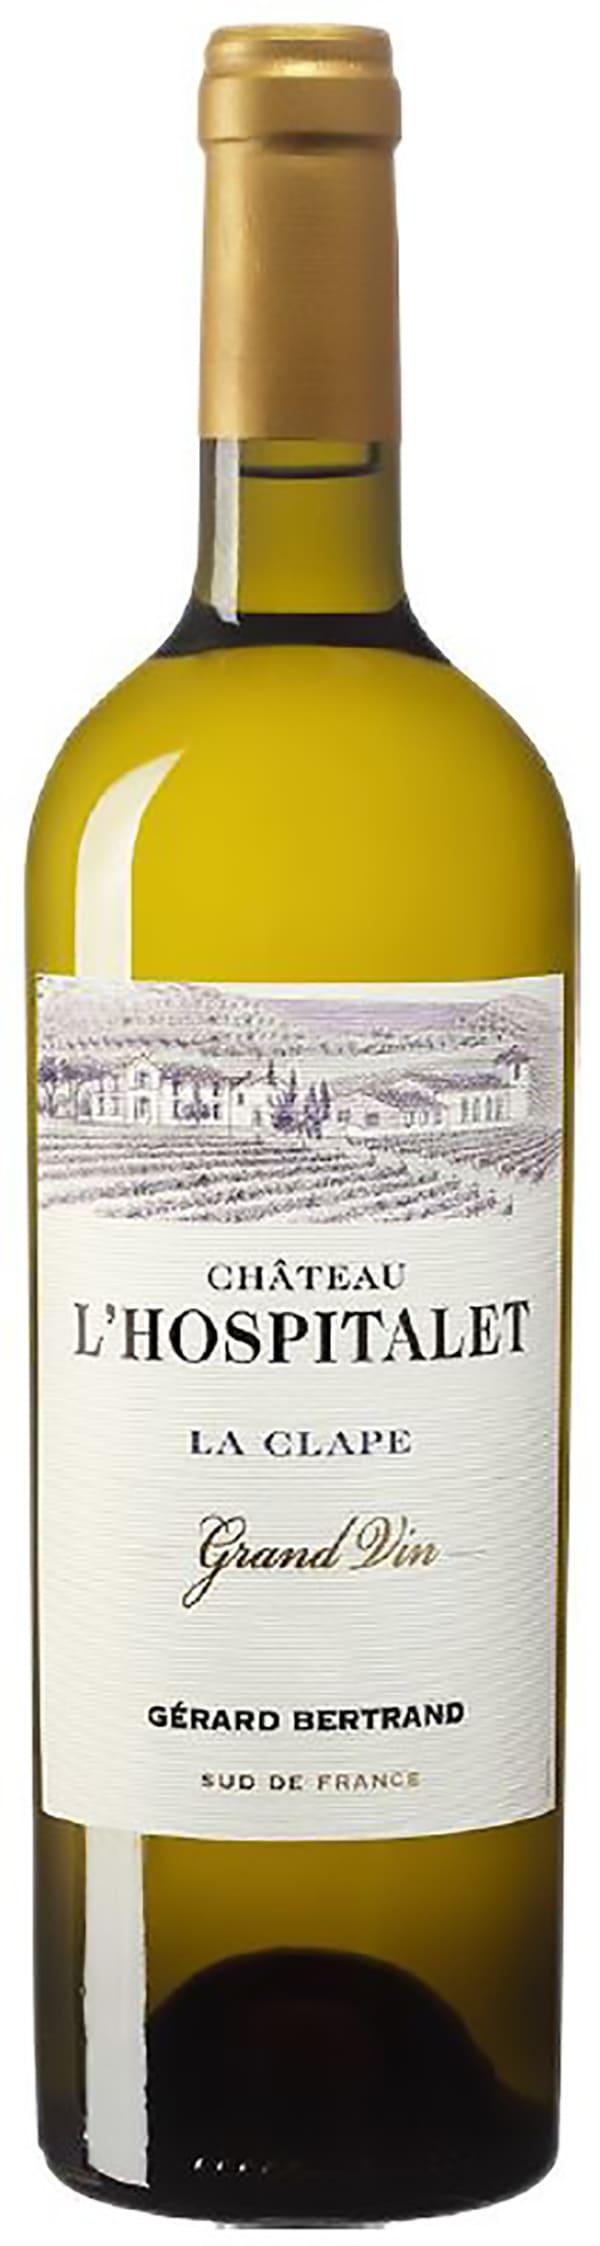 Gerard Bertrand Château Hospitalet Grand Vin La Clape 2014